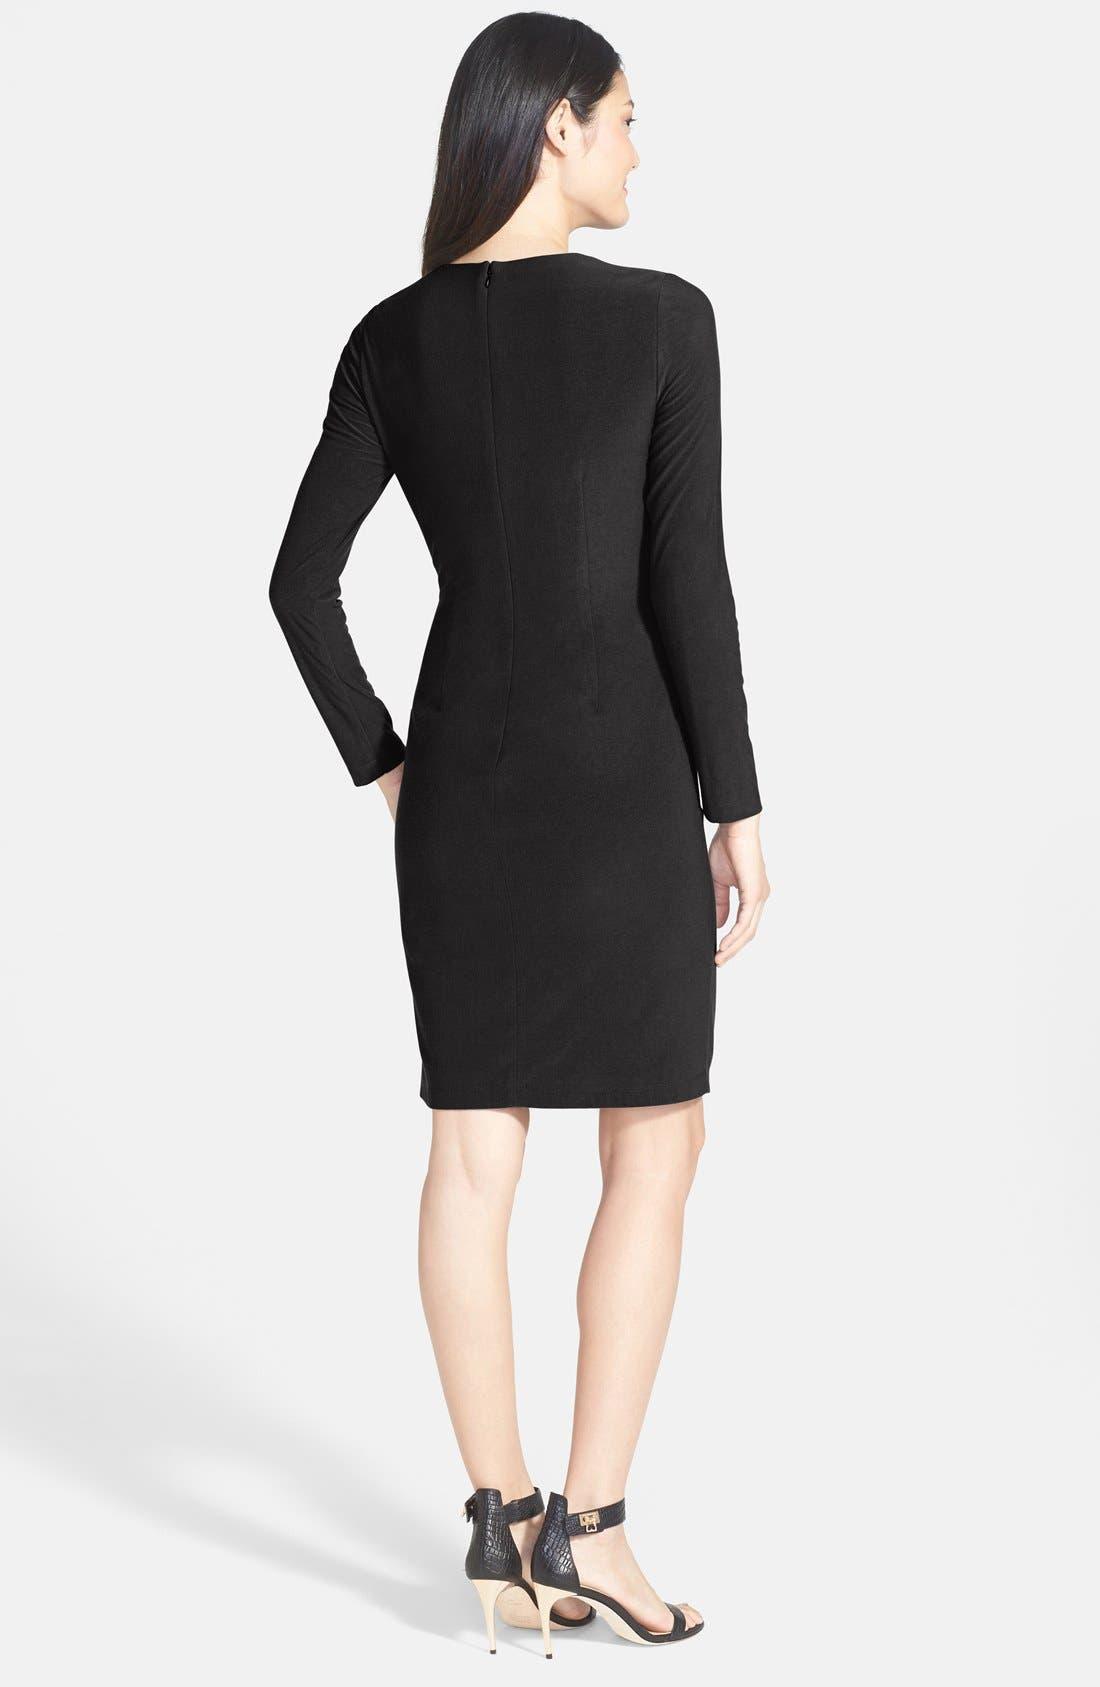 VINCE CAMUTO,                             Faux Leather Panel Ponte Sheath Dress,                             Alternate thumbnail 2, color,                             001